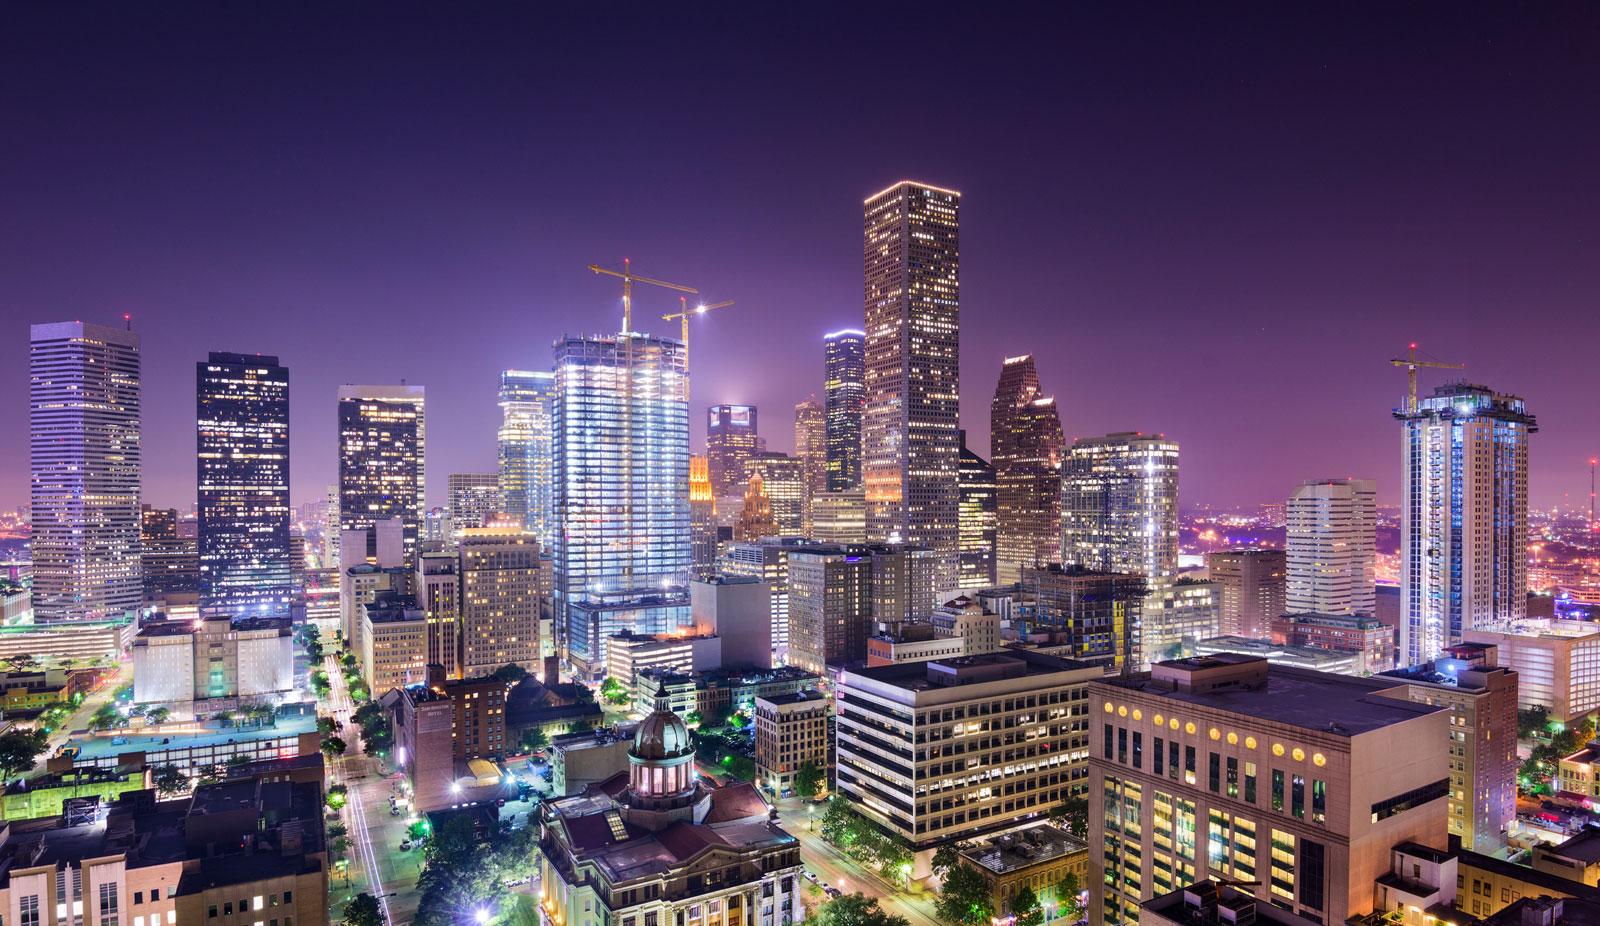 Night time in Metro Houston